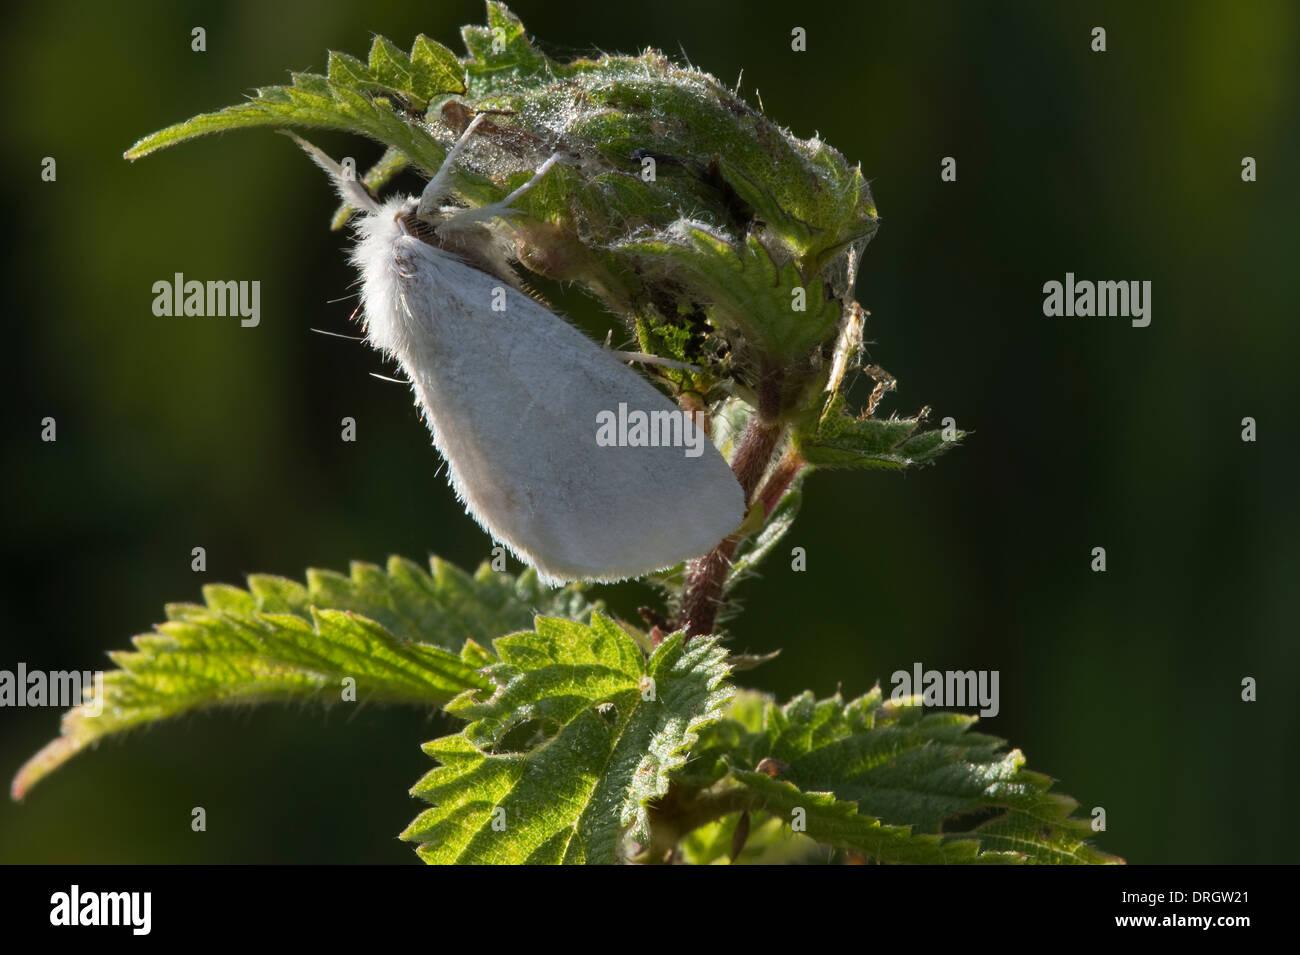 Gelb-Tail, Goldtail Motte oder Swan Moth (Euproctis Similis) beruht auf der Brennnessel Preston Montford Shrewsbury Shropshire, England Stockbild